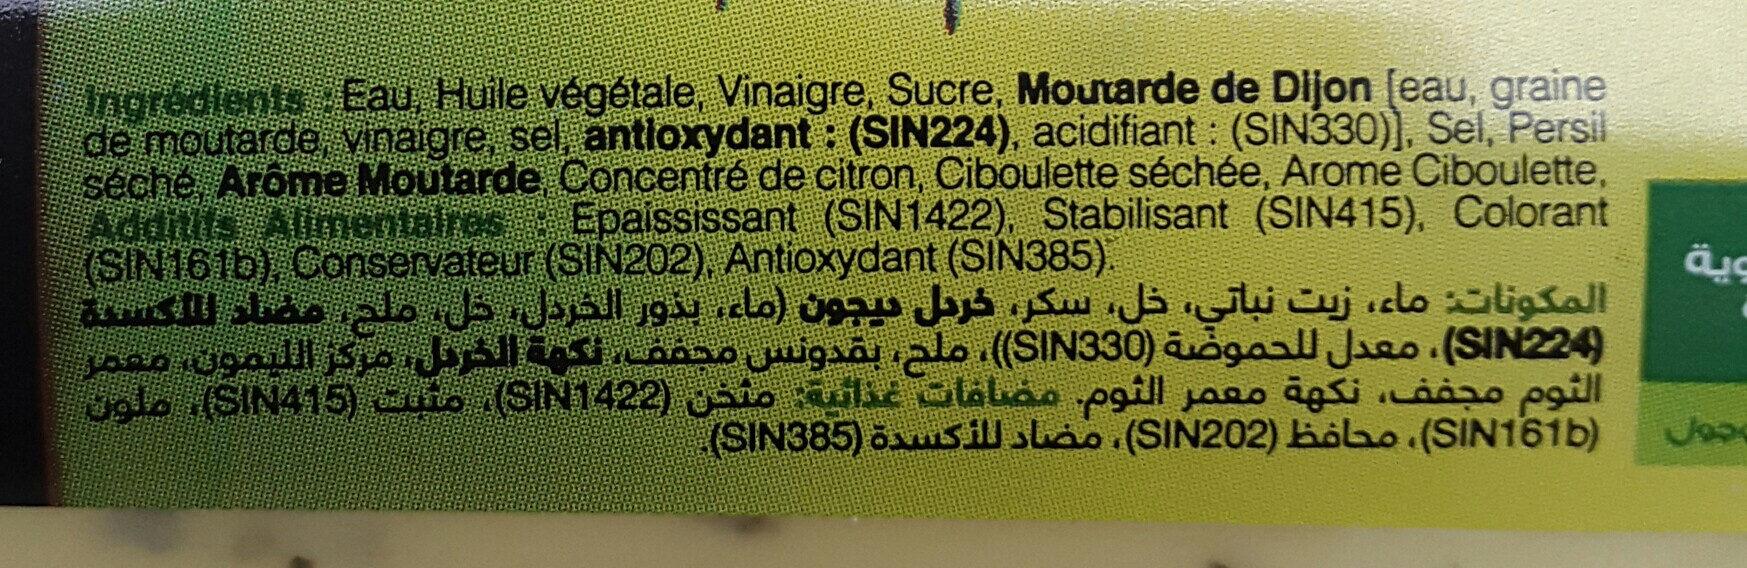 sauce vinaigrette - المكونات - fr